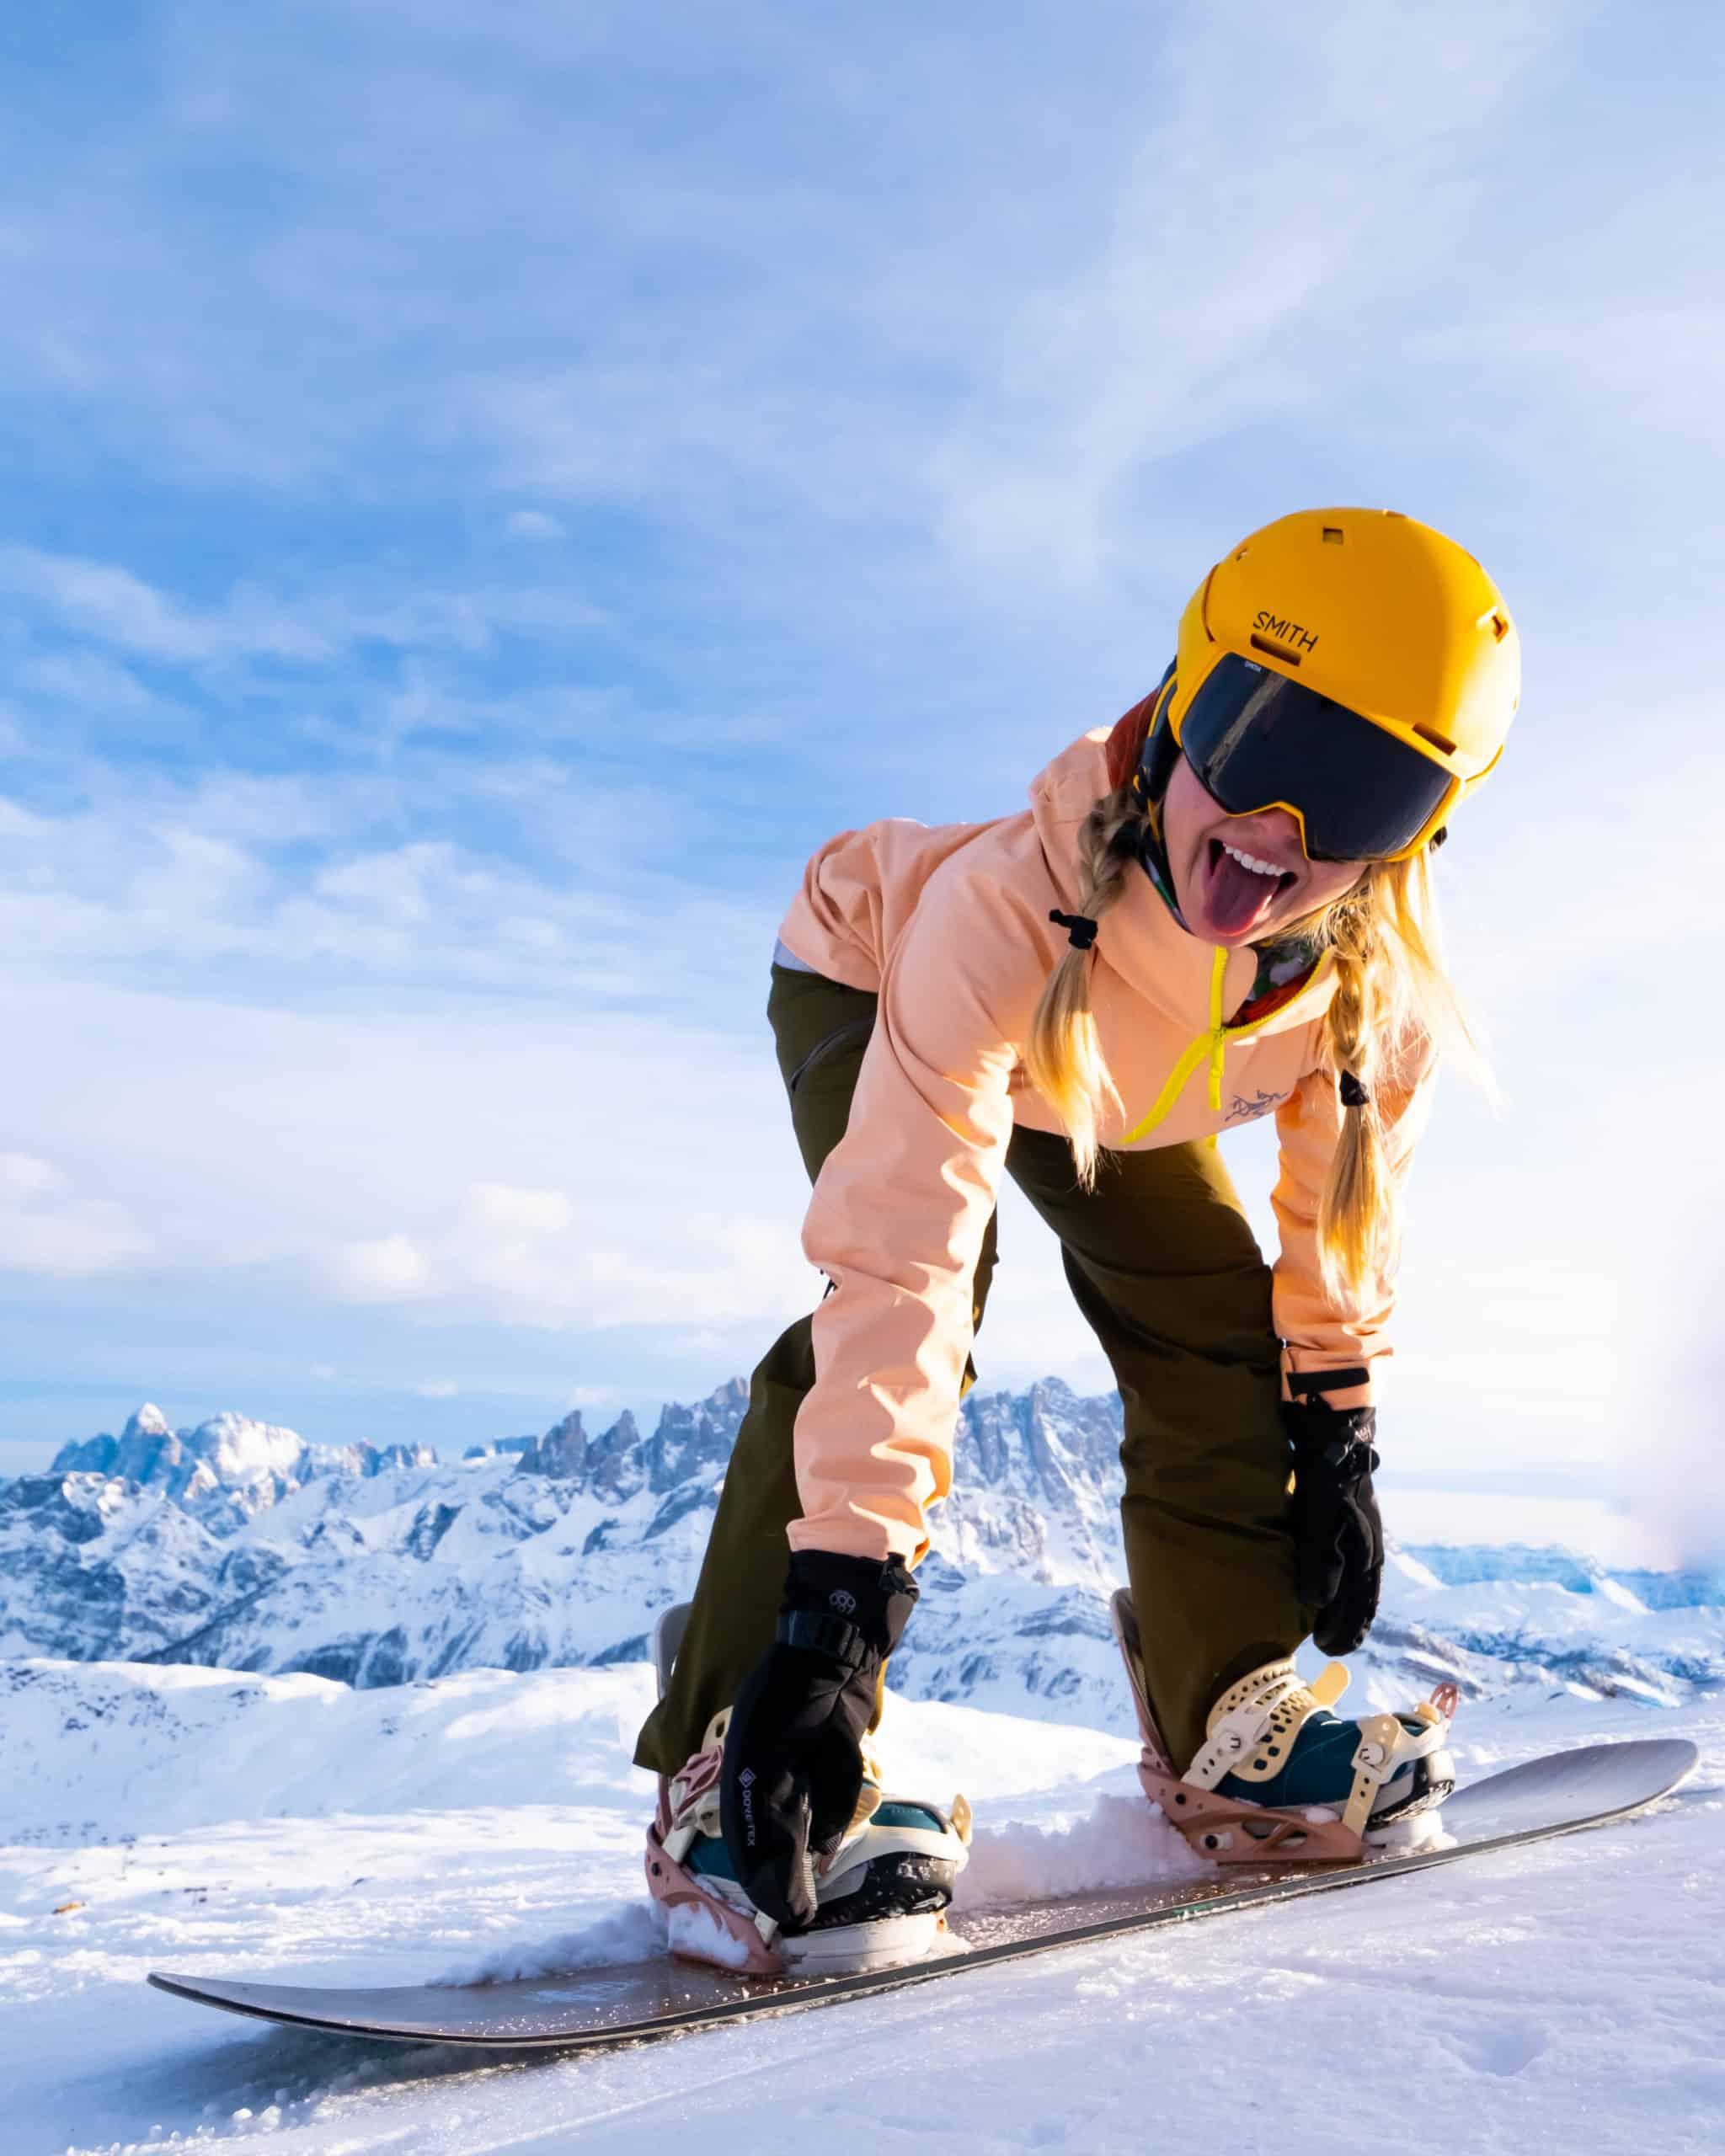 Nathasha at Ski Dolomiti wearing Arc'teryx Ski Outfit Smith 4d Goggles Smith Vantage Helmet and a Jones Flagship with Burton Lexa bindings